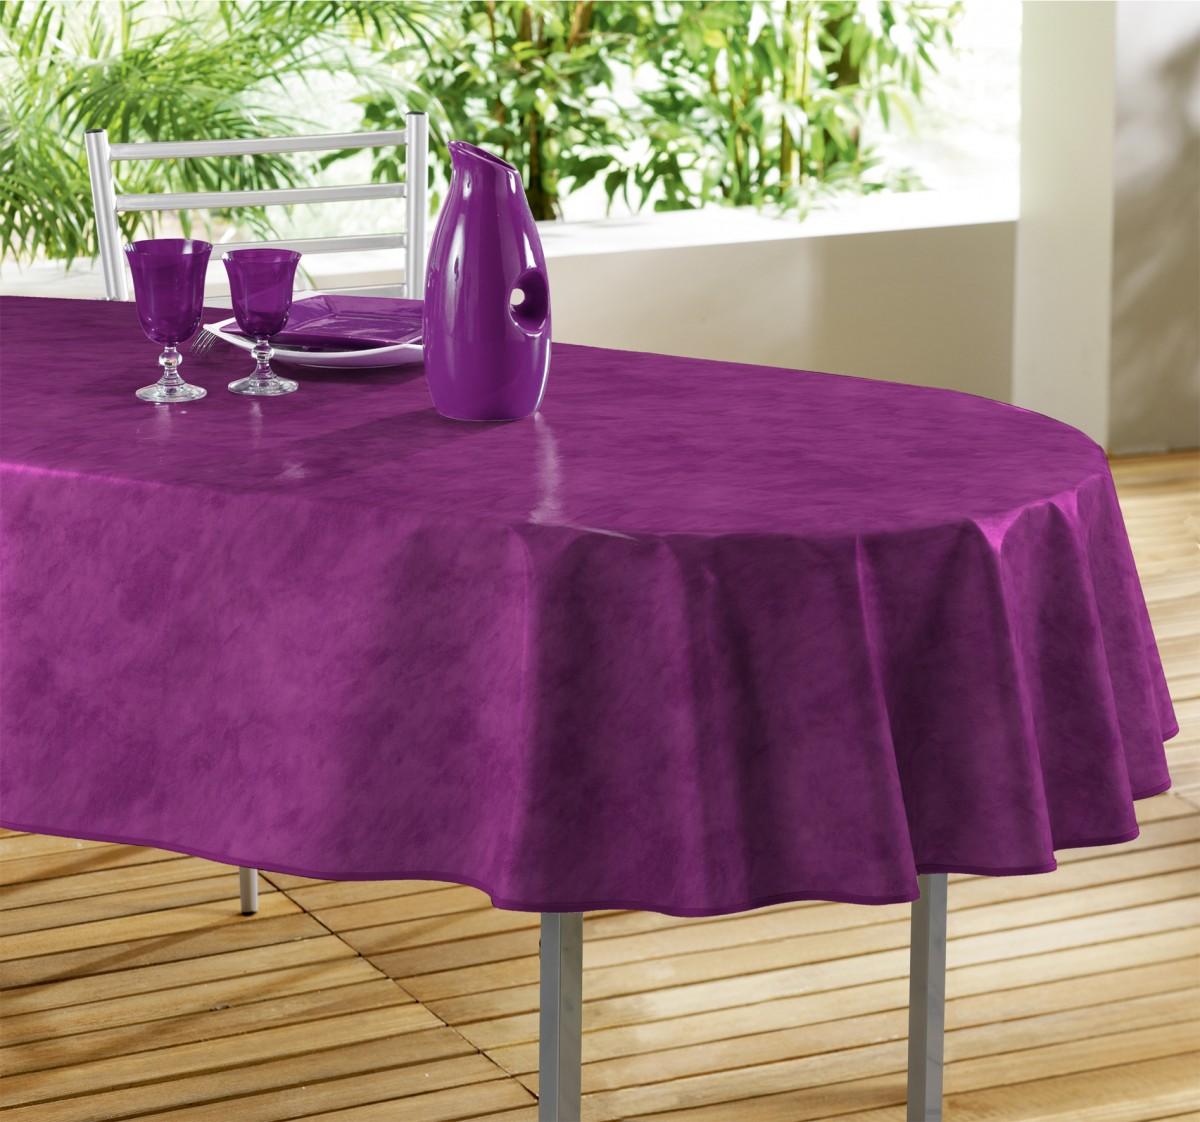 nappe toile ciree ovale beton cir aubergine. Black Bedroom Furniture Sets. Home Design Ideas